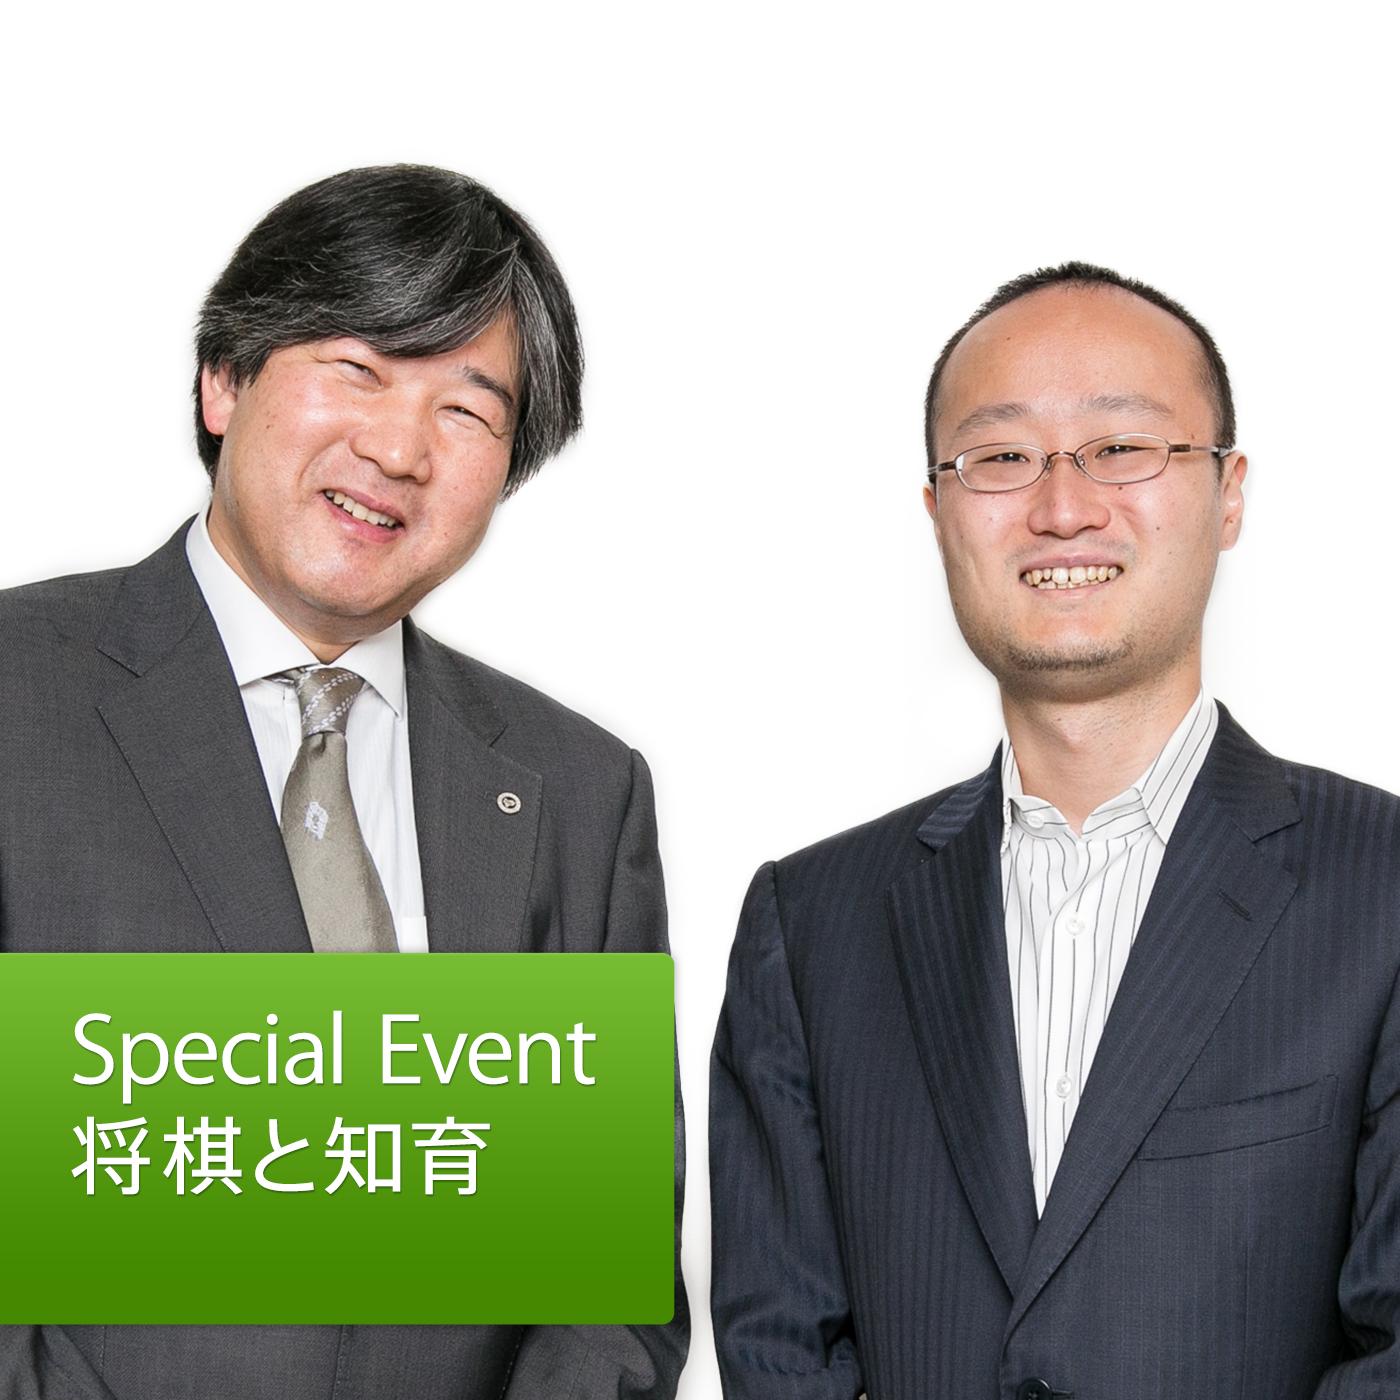 渡辺明 x 吉田茂 将棋と知育: Special Event